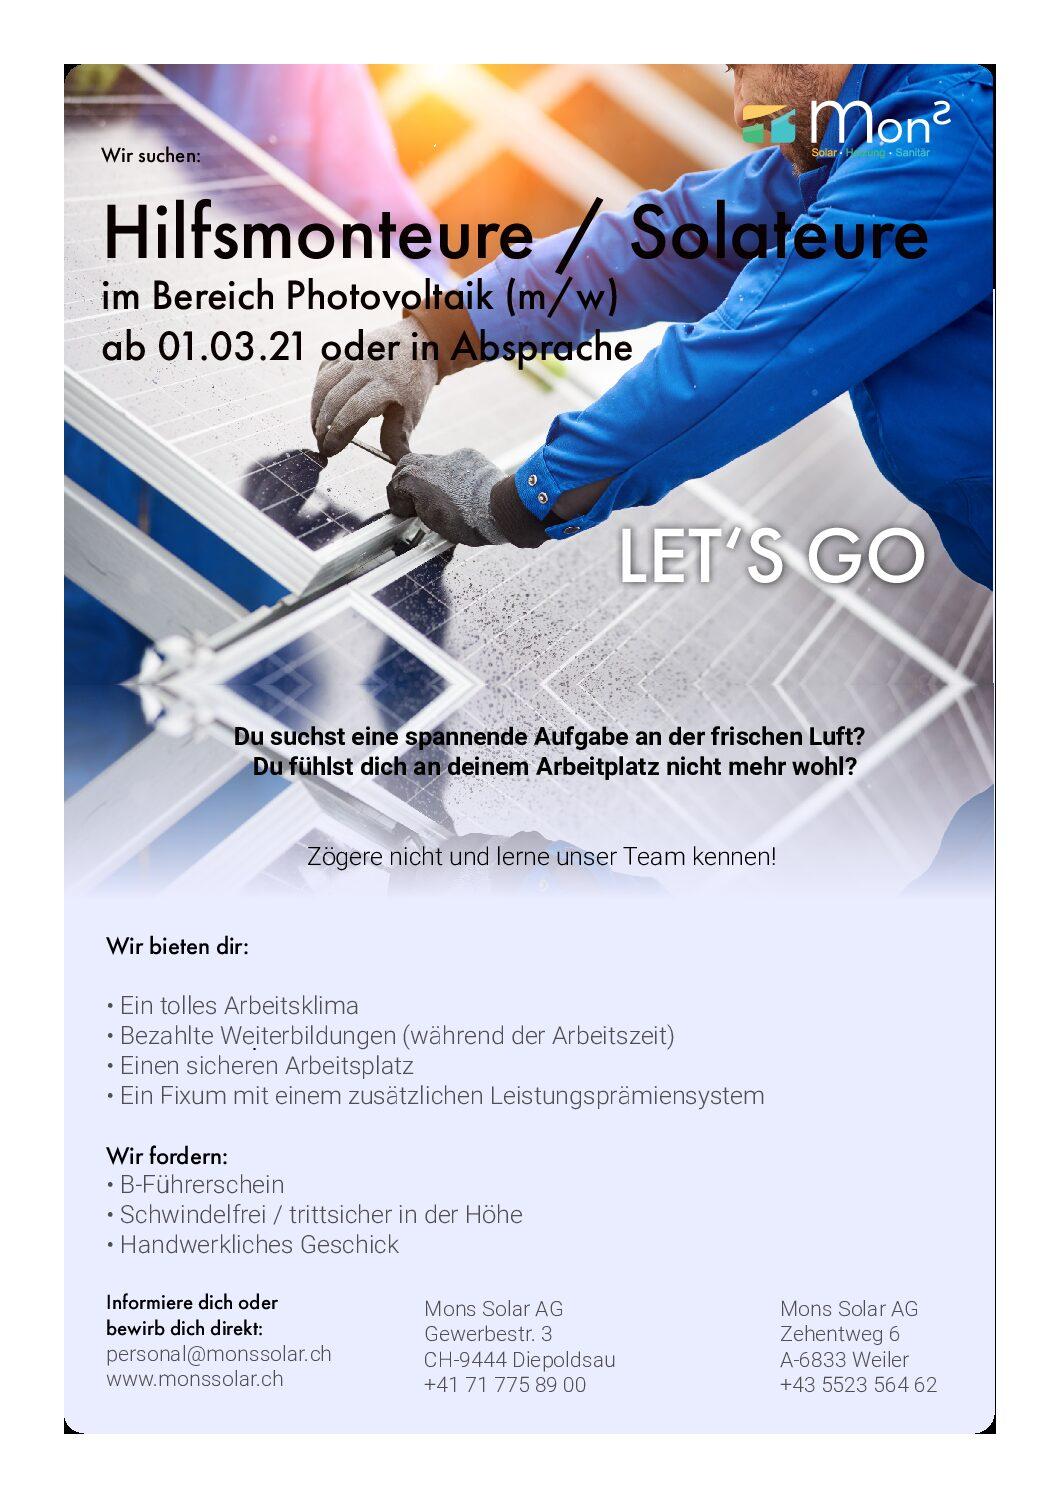 Hilfsmonteur Photovoltaik ab 1.3.21